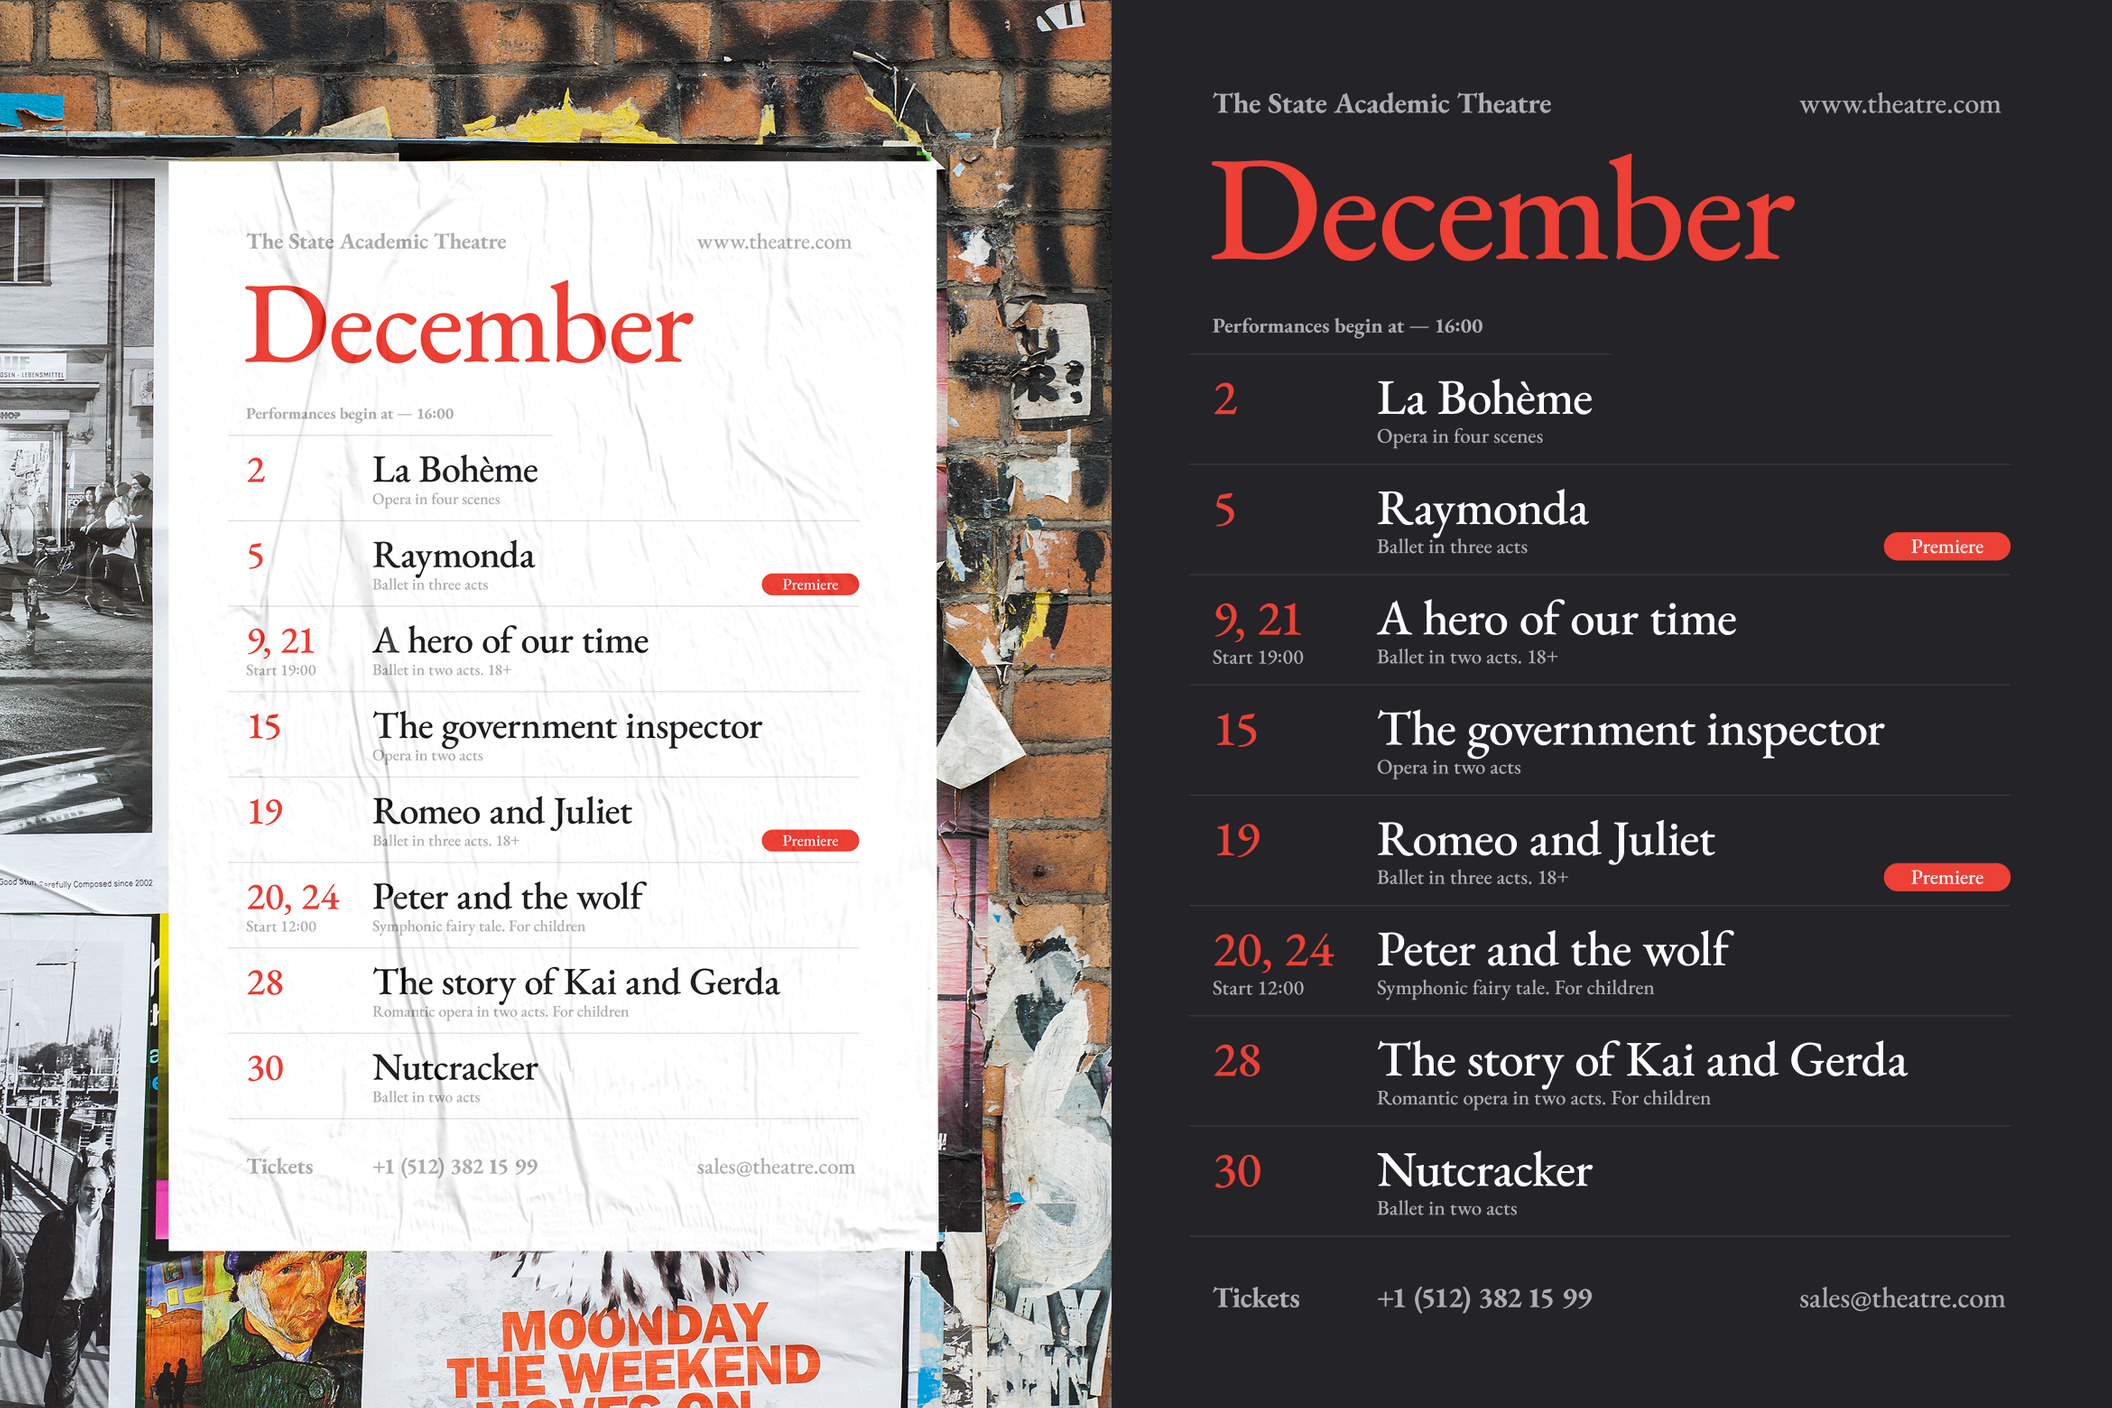 Theatre Schedule Poster #3